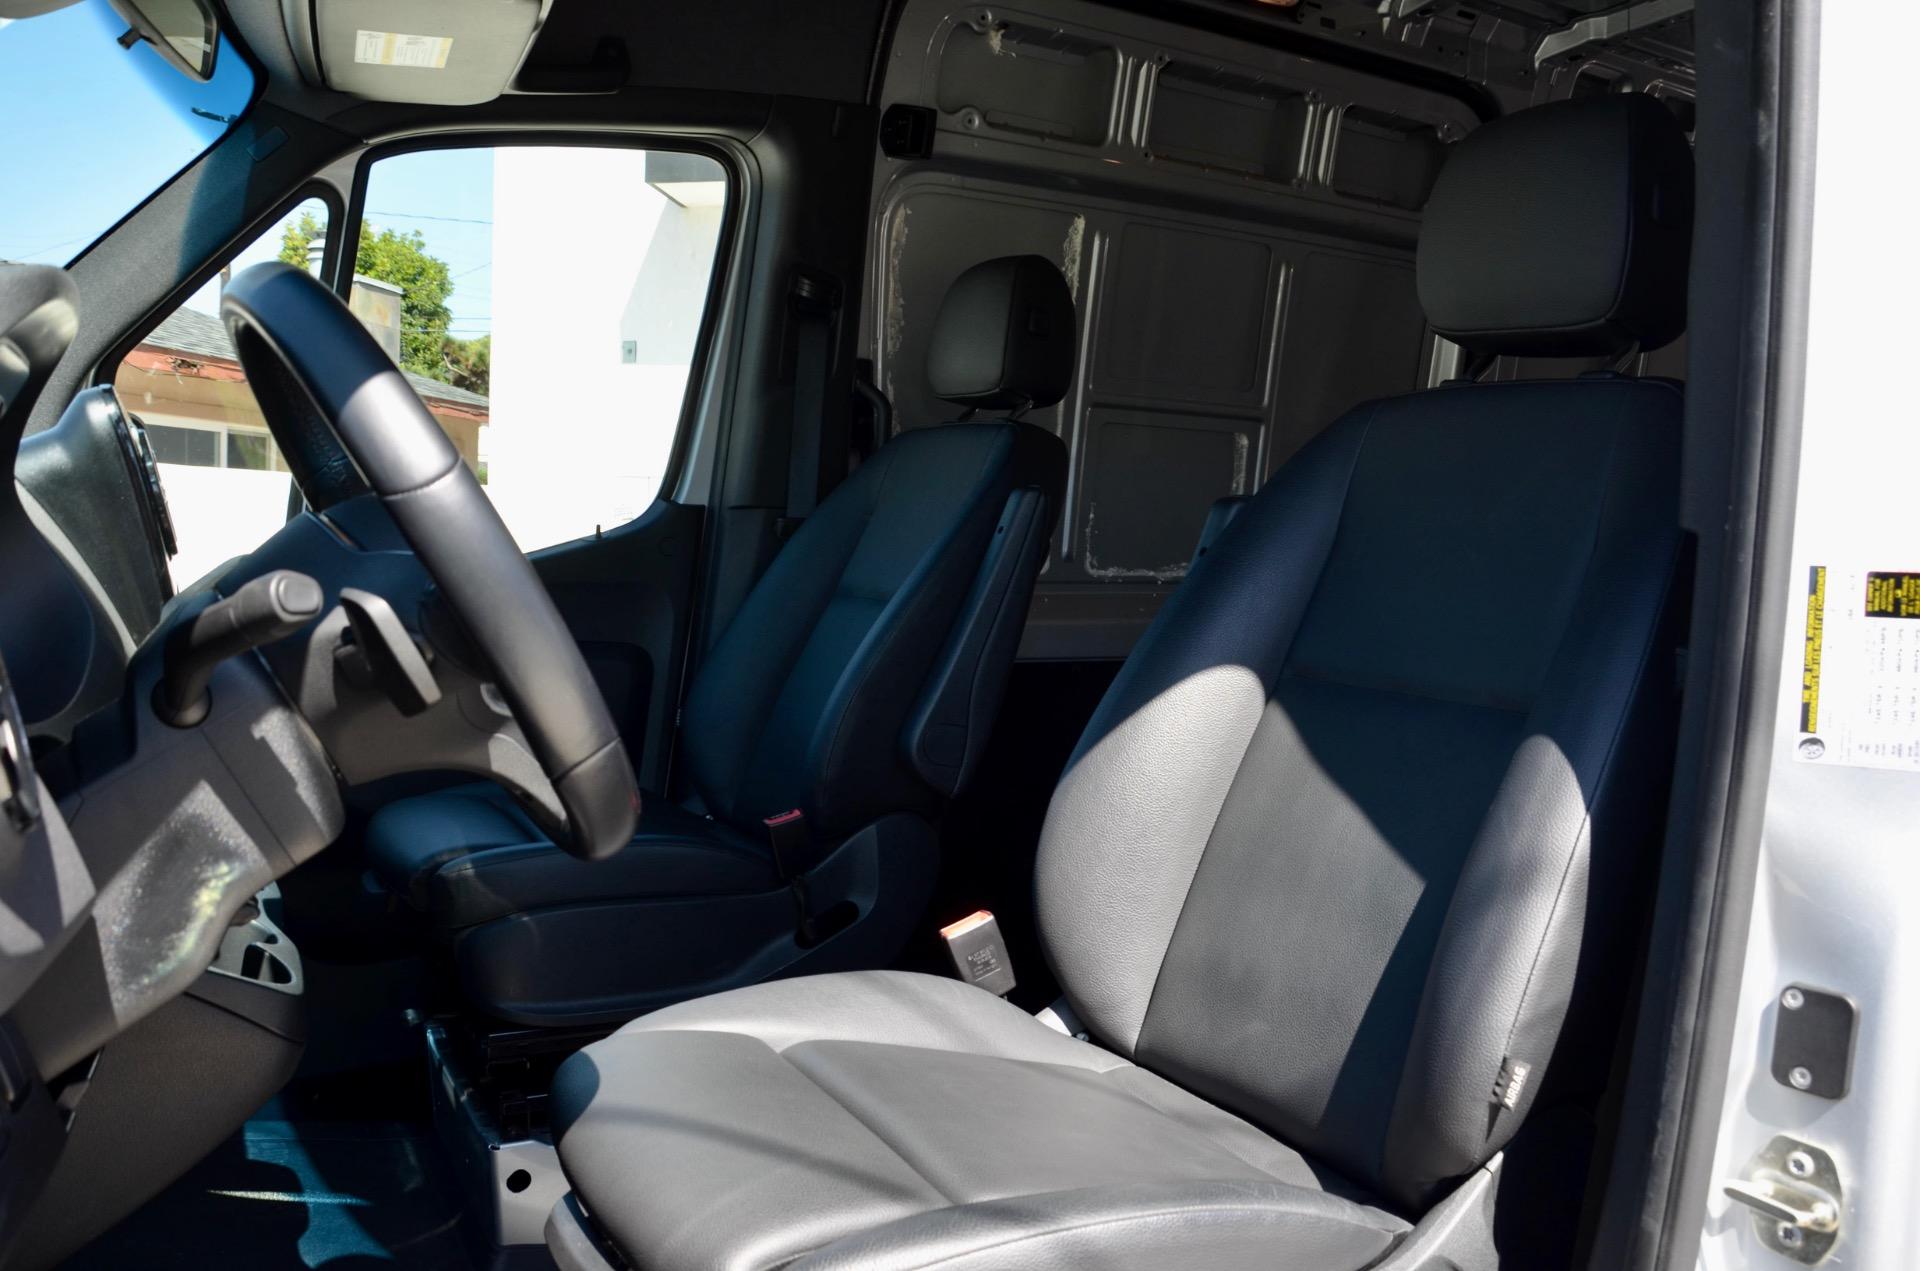 Used-2019-Mercedes-Benz-Sprinter-Cargo-2500